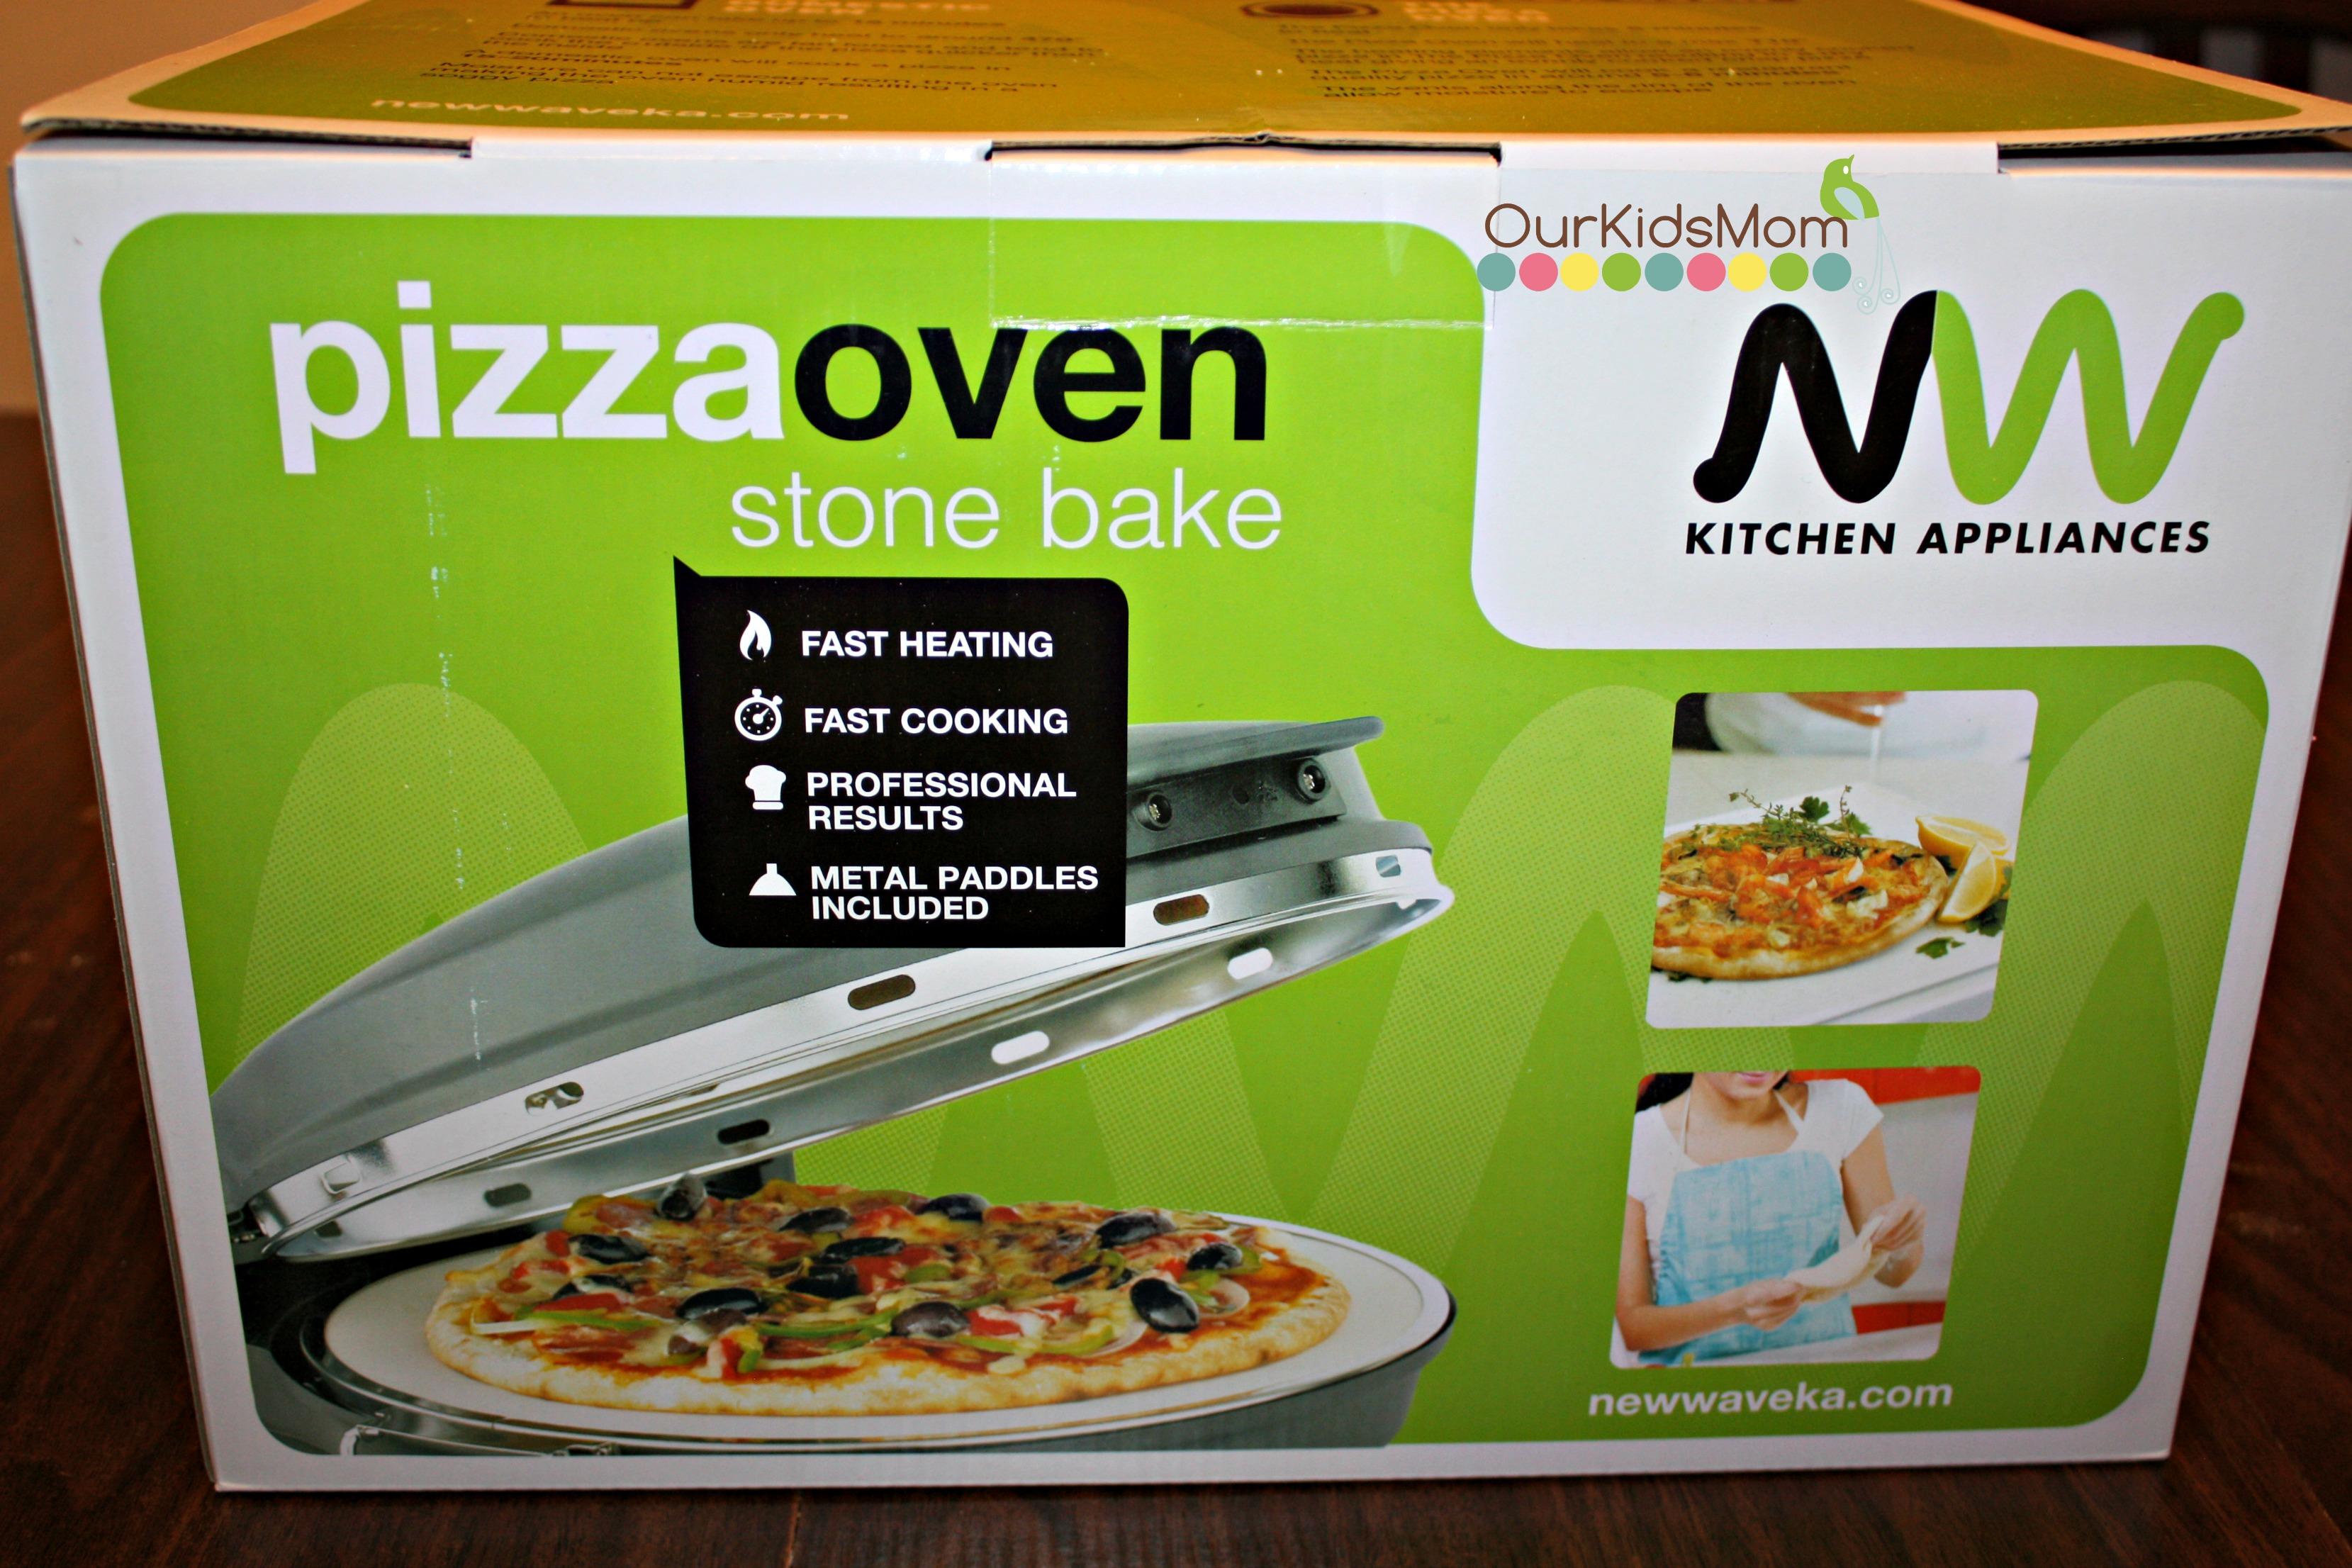 New wave kitchen appliances Photo - 8